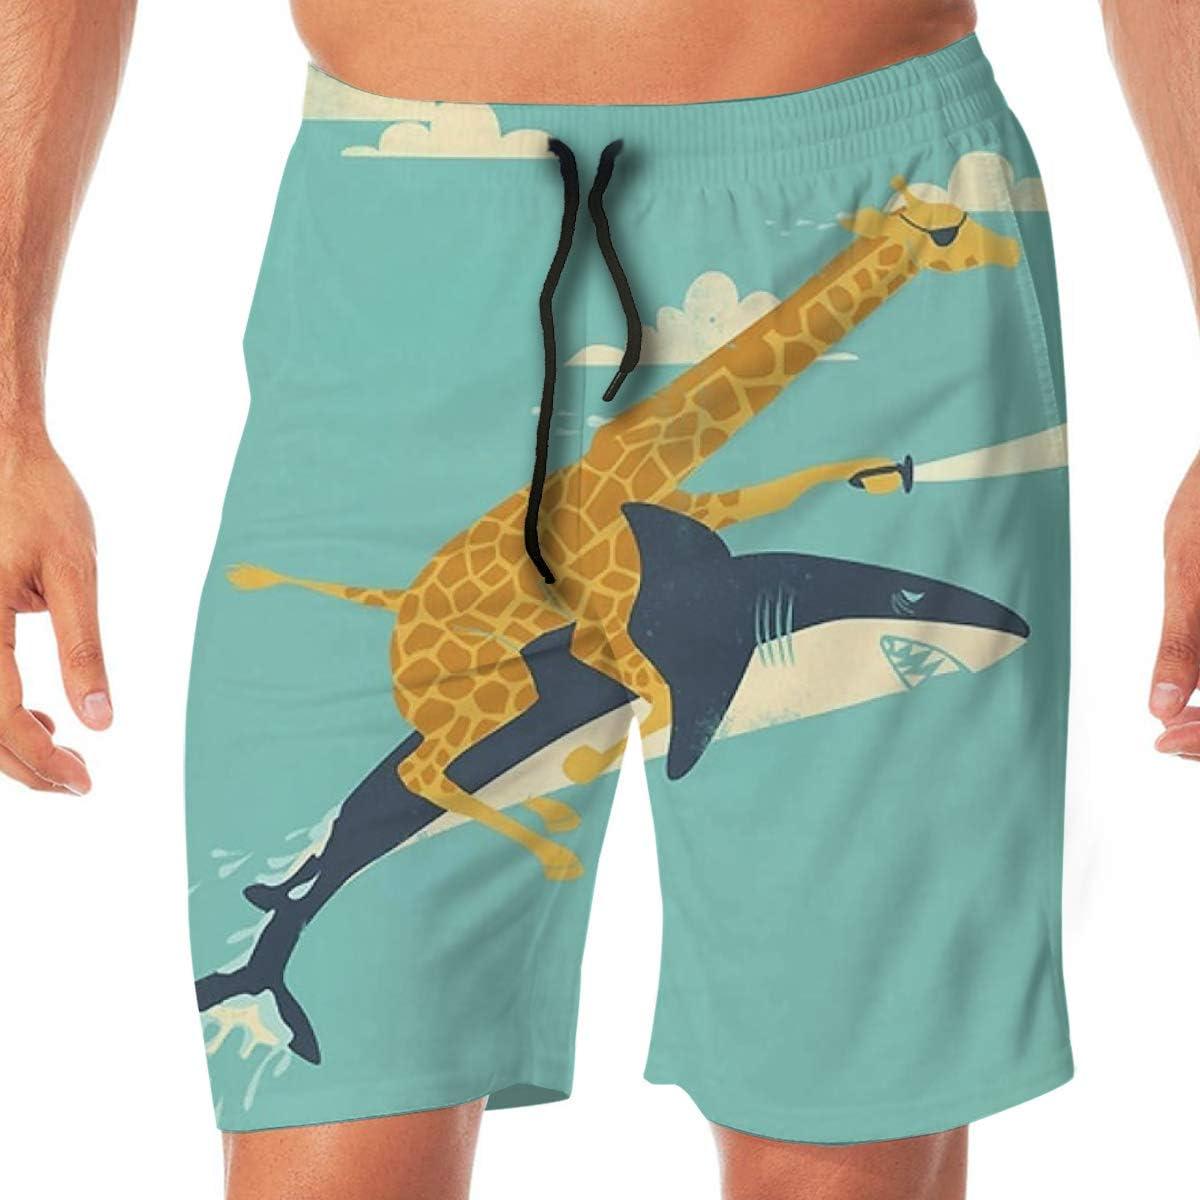 Quick Dry Men's Beach Shorts Funny Giraffe Shark Print Surfing Trunks Surf Board Pants Pockets